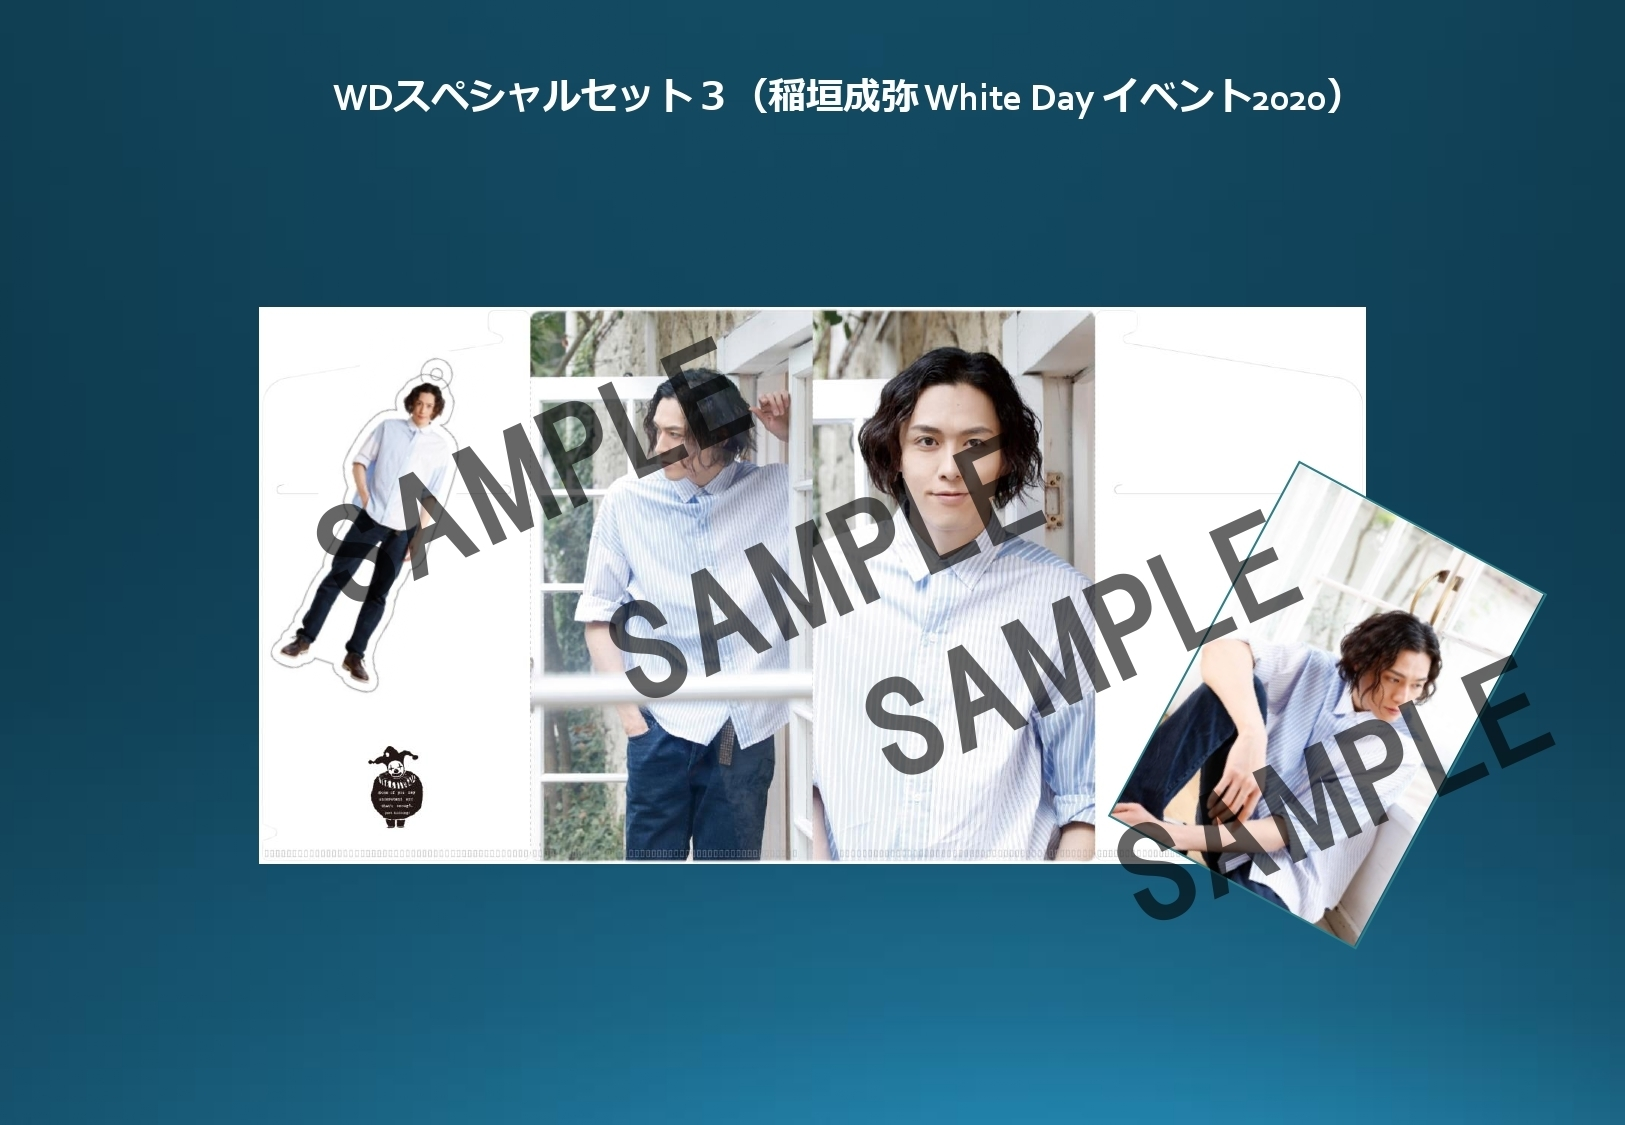 WDスペシャルセット3(White Day イベント2020)